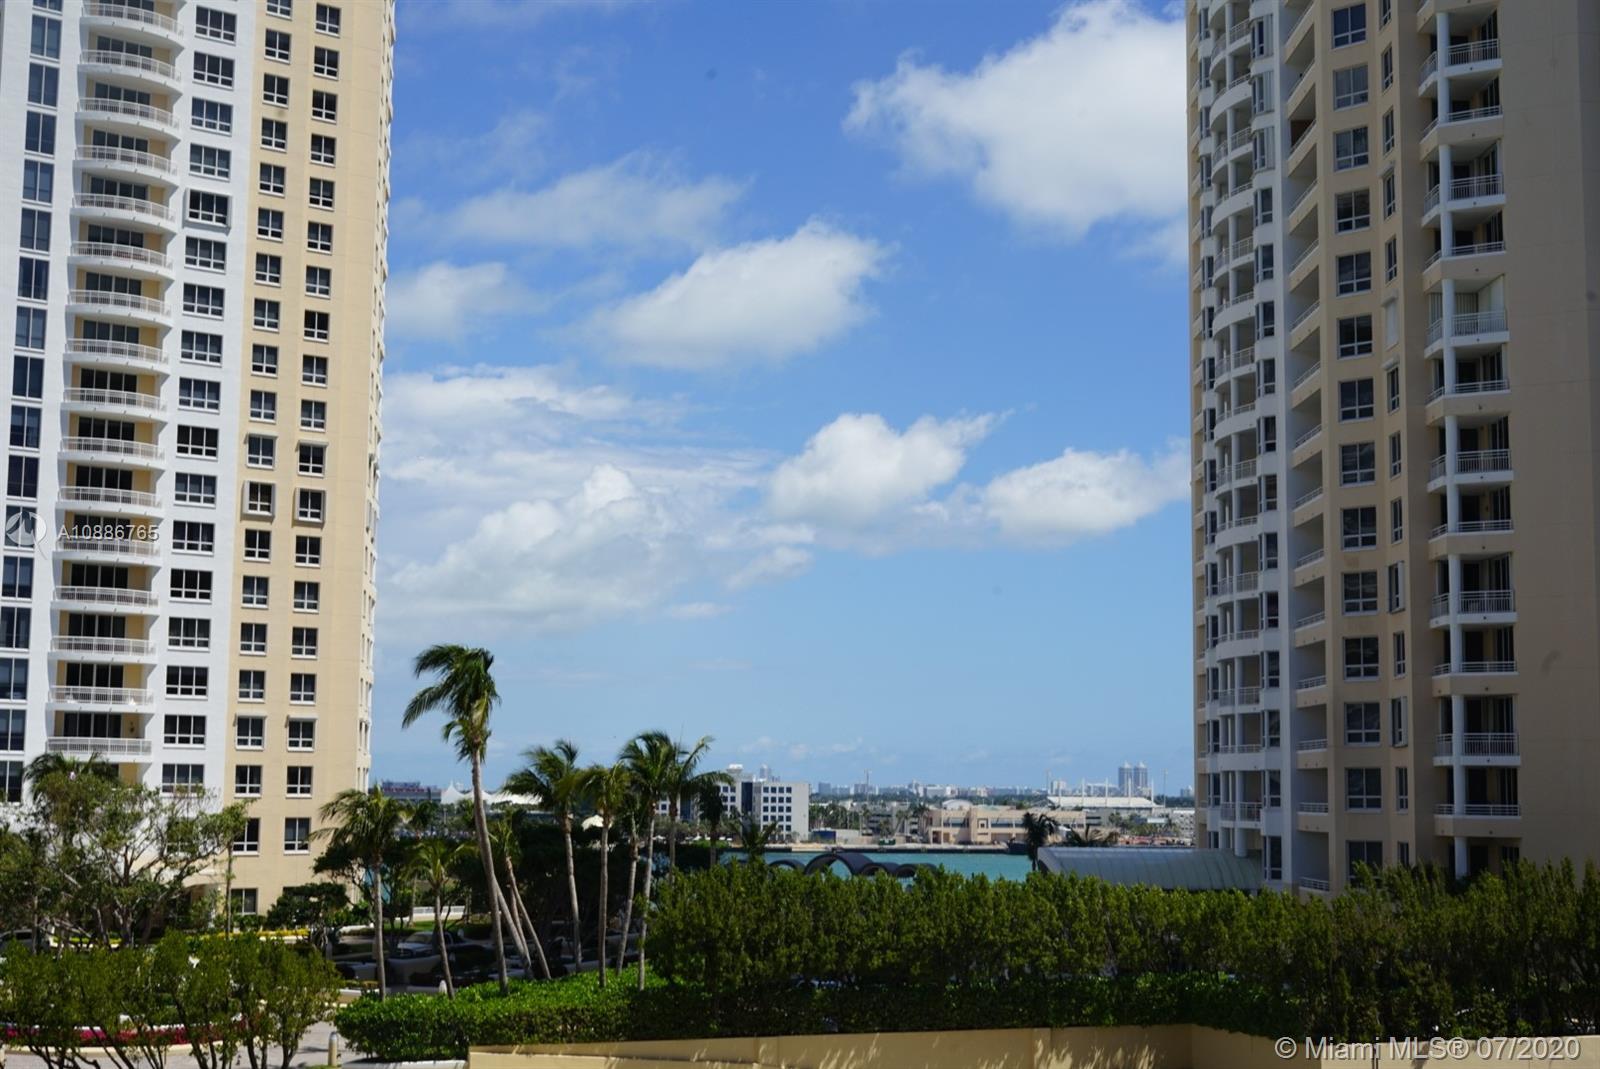 Brickell Key Two #804 - 540 Brickell Key Dr #804, Miami, FL 33131